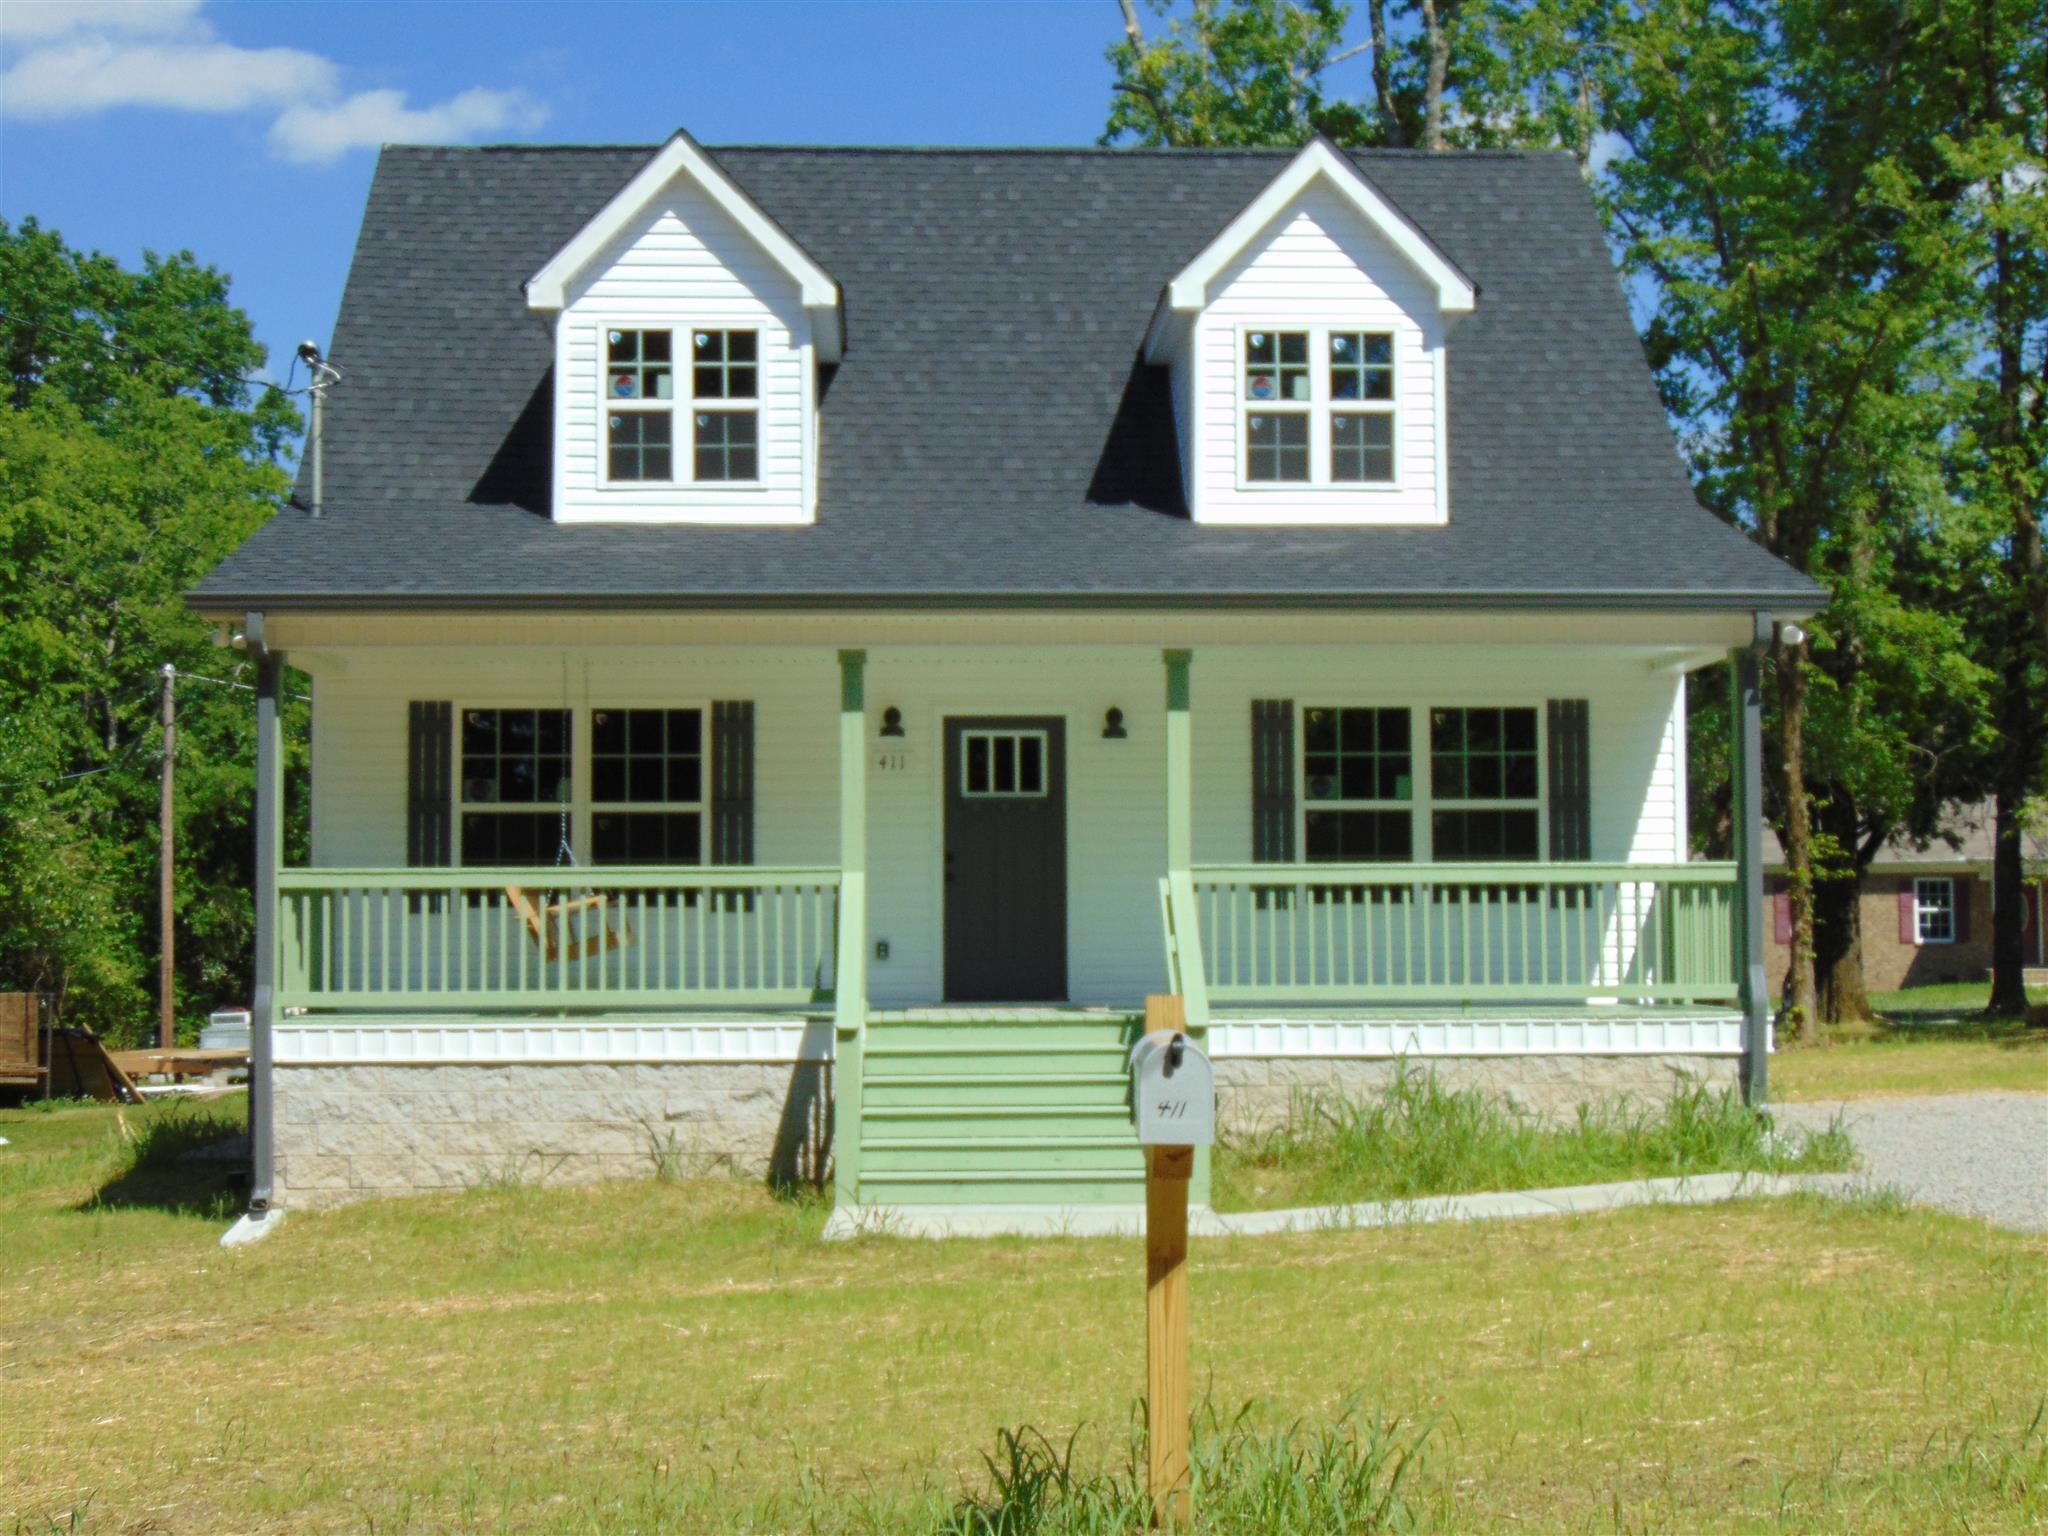 411 Will Murphy Rd, Lewisburg, TN 37091 - Lewisburg, TN real estate listing